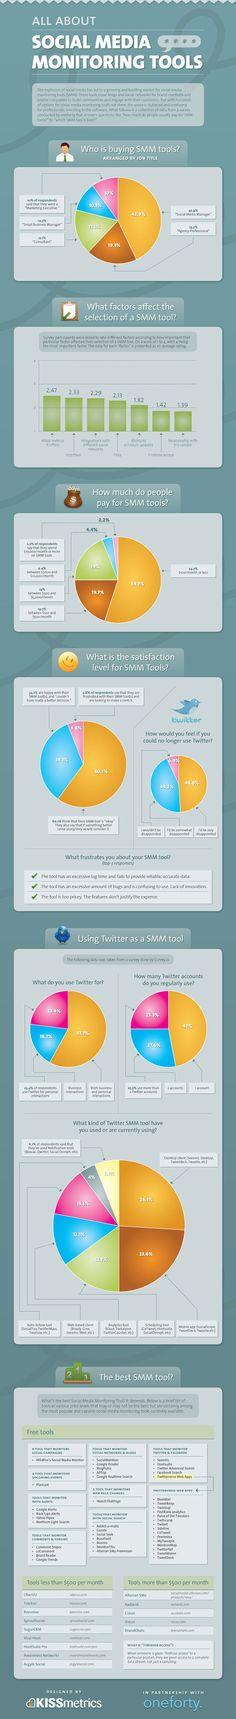 Inforaphic: #SocialMedia monitoring tools.